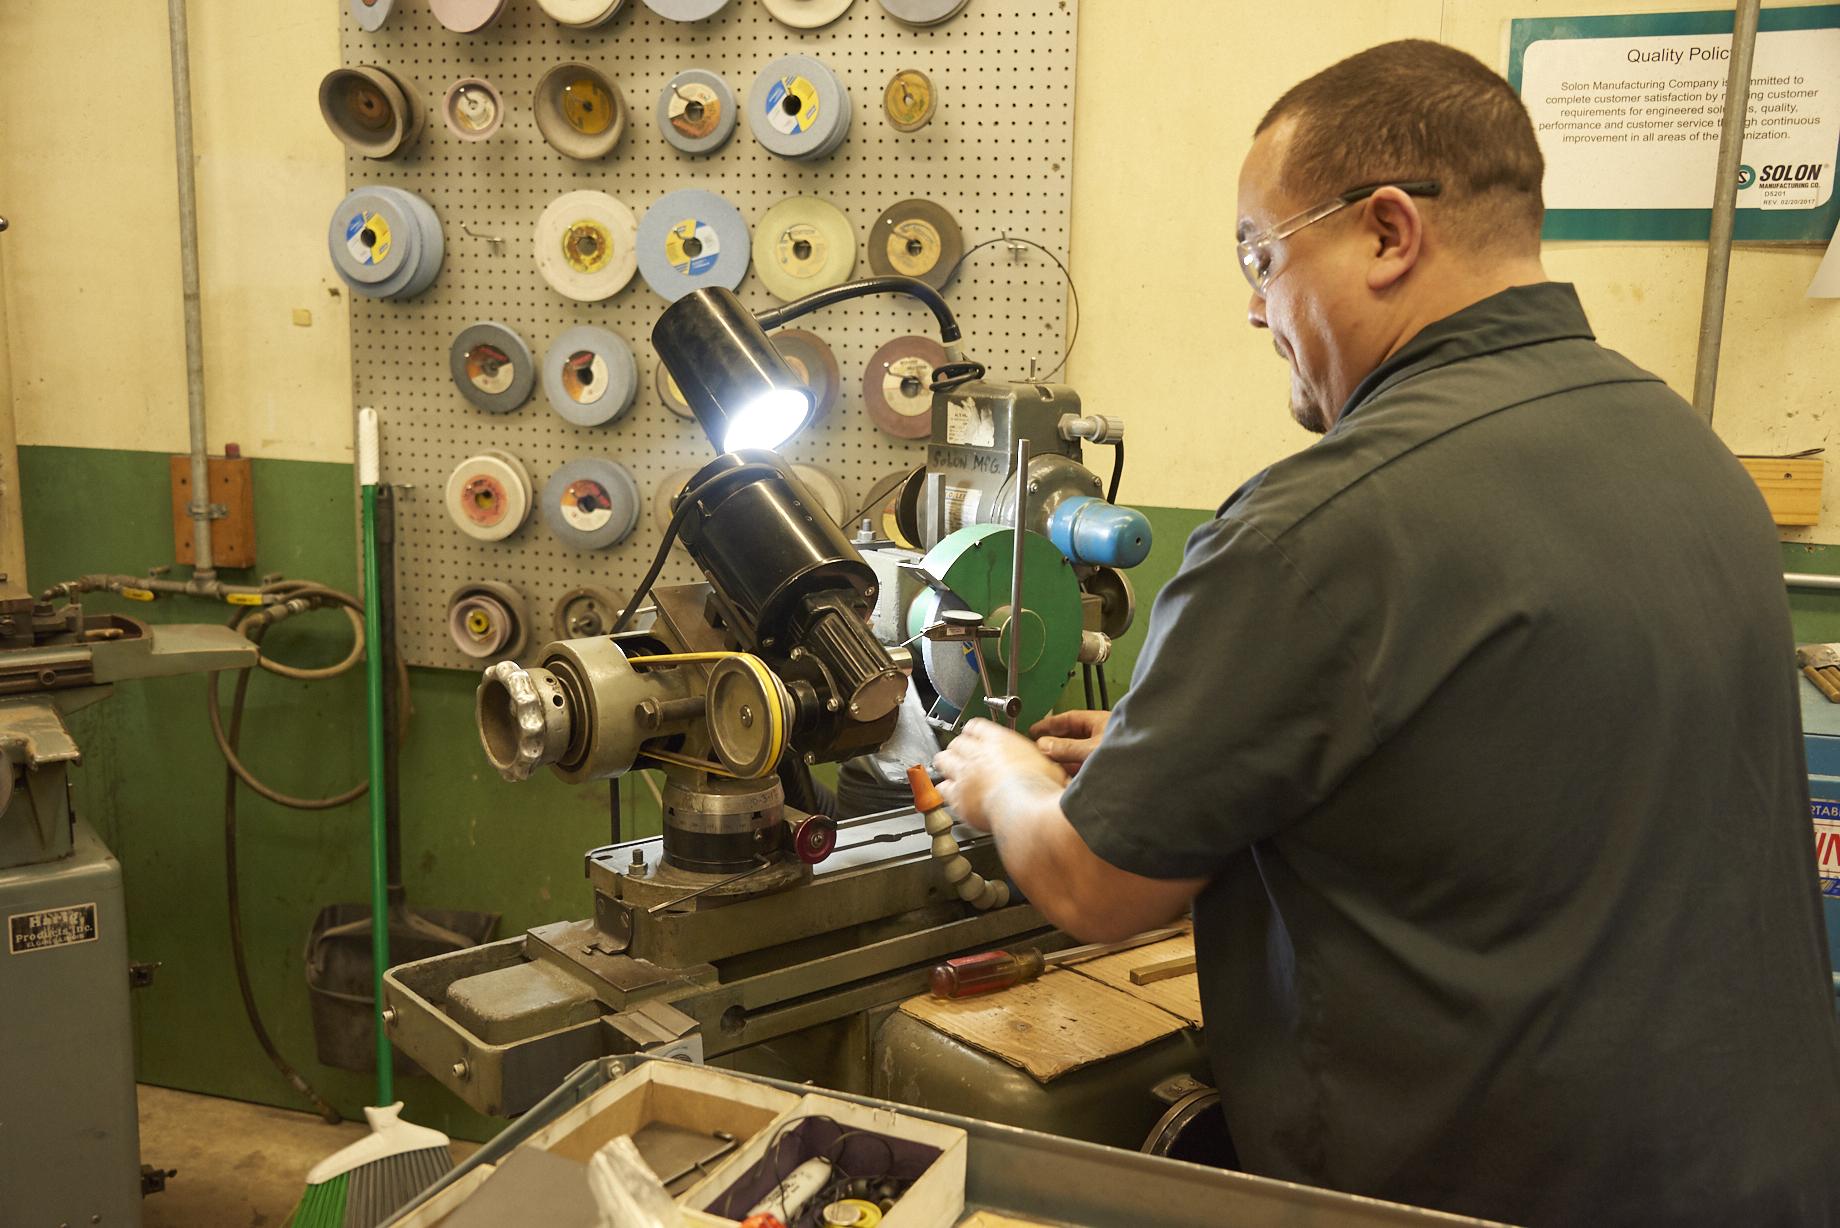 Solon Manufacturing